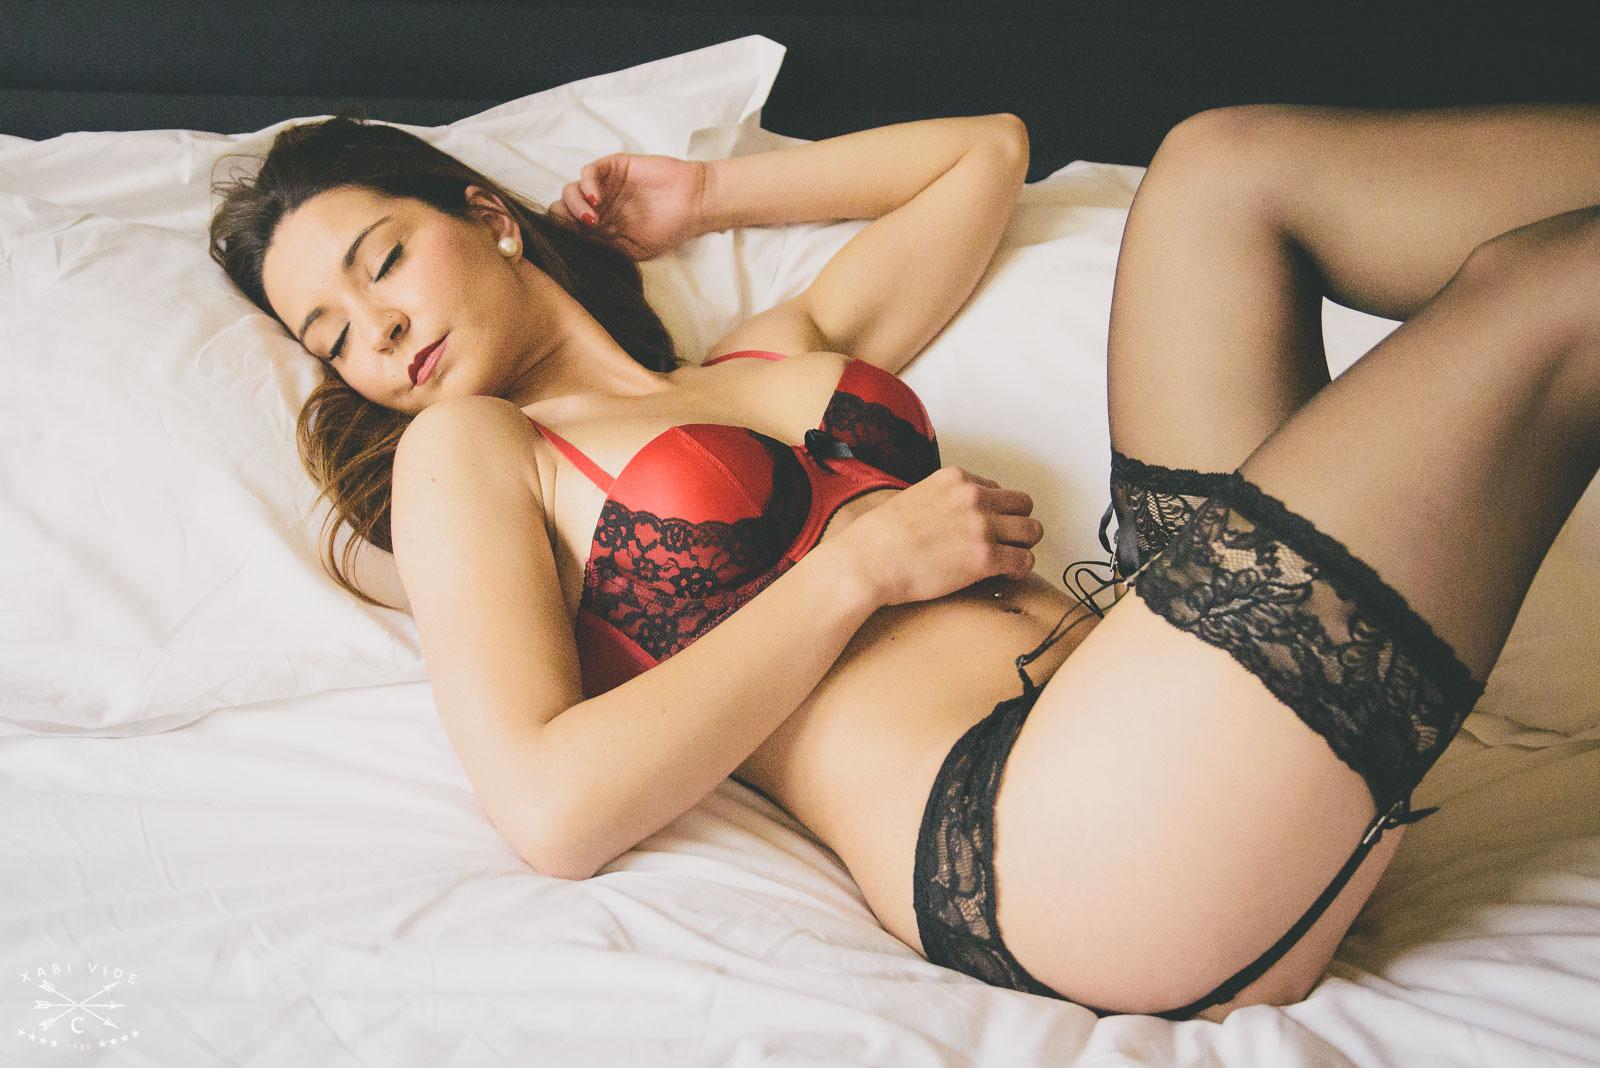 natalia_boudoir_xabivide-26